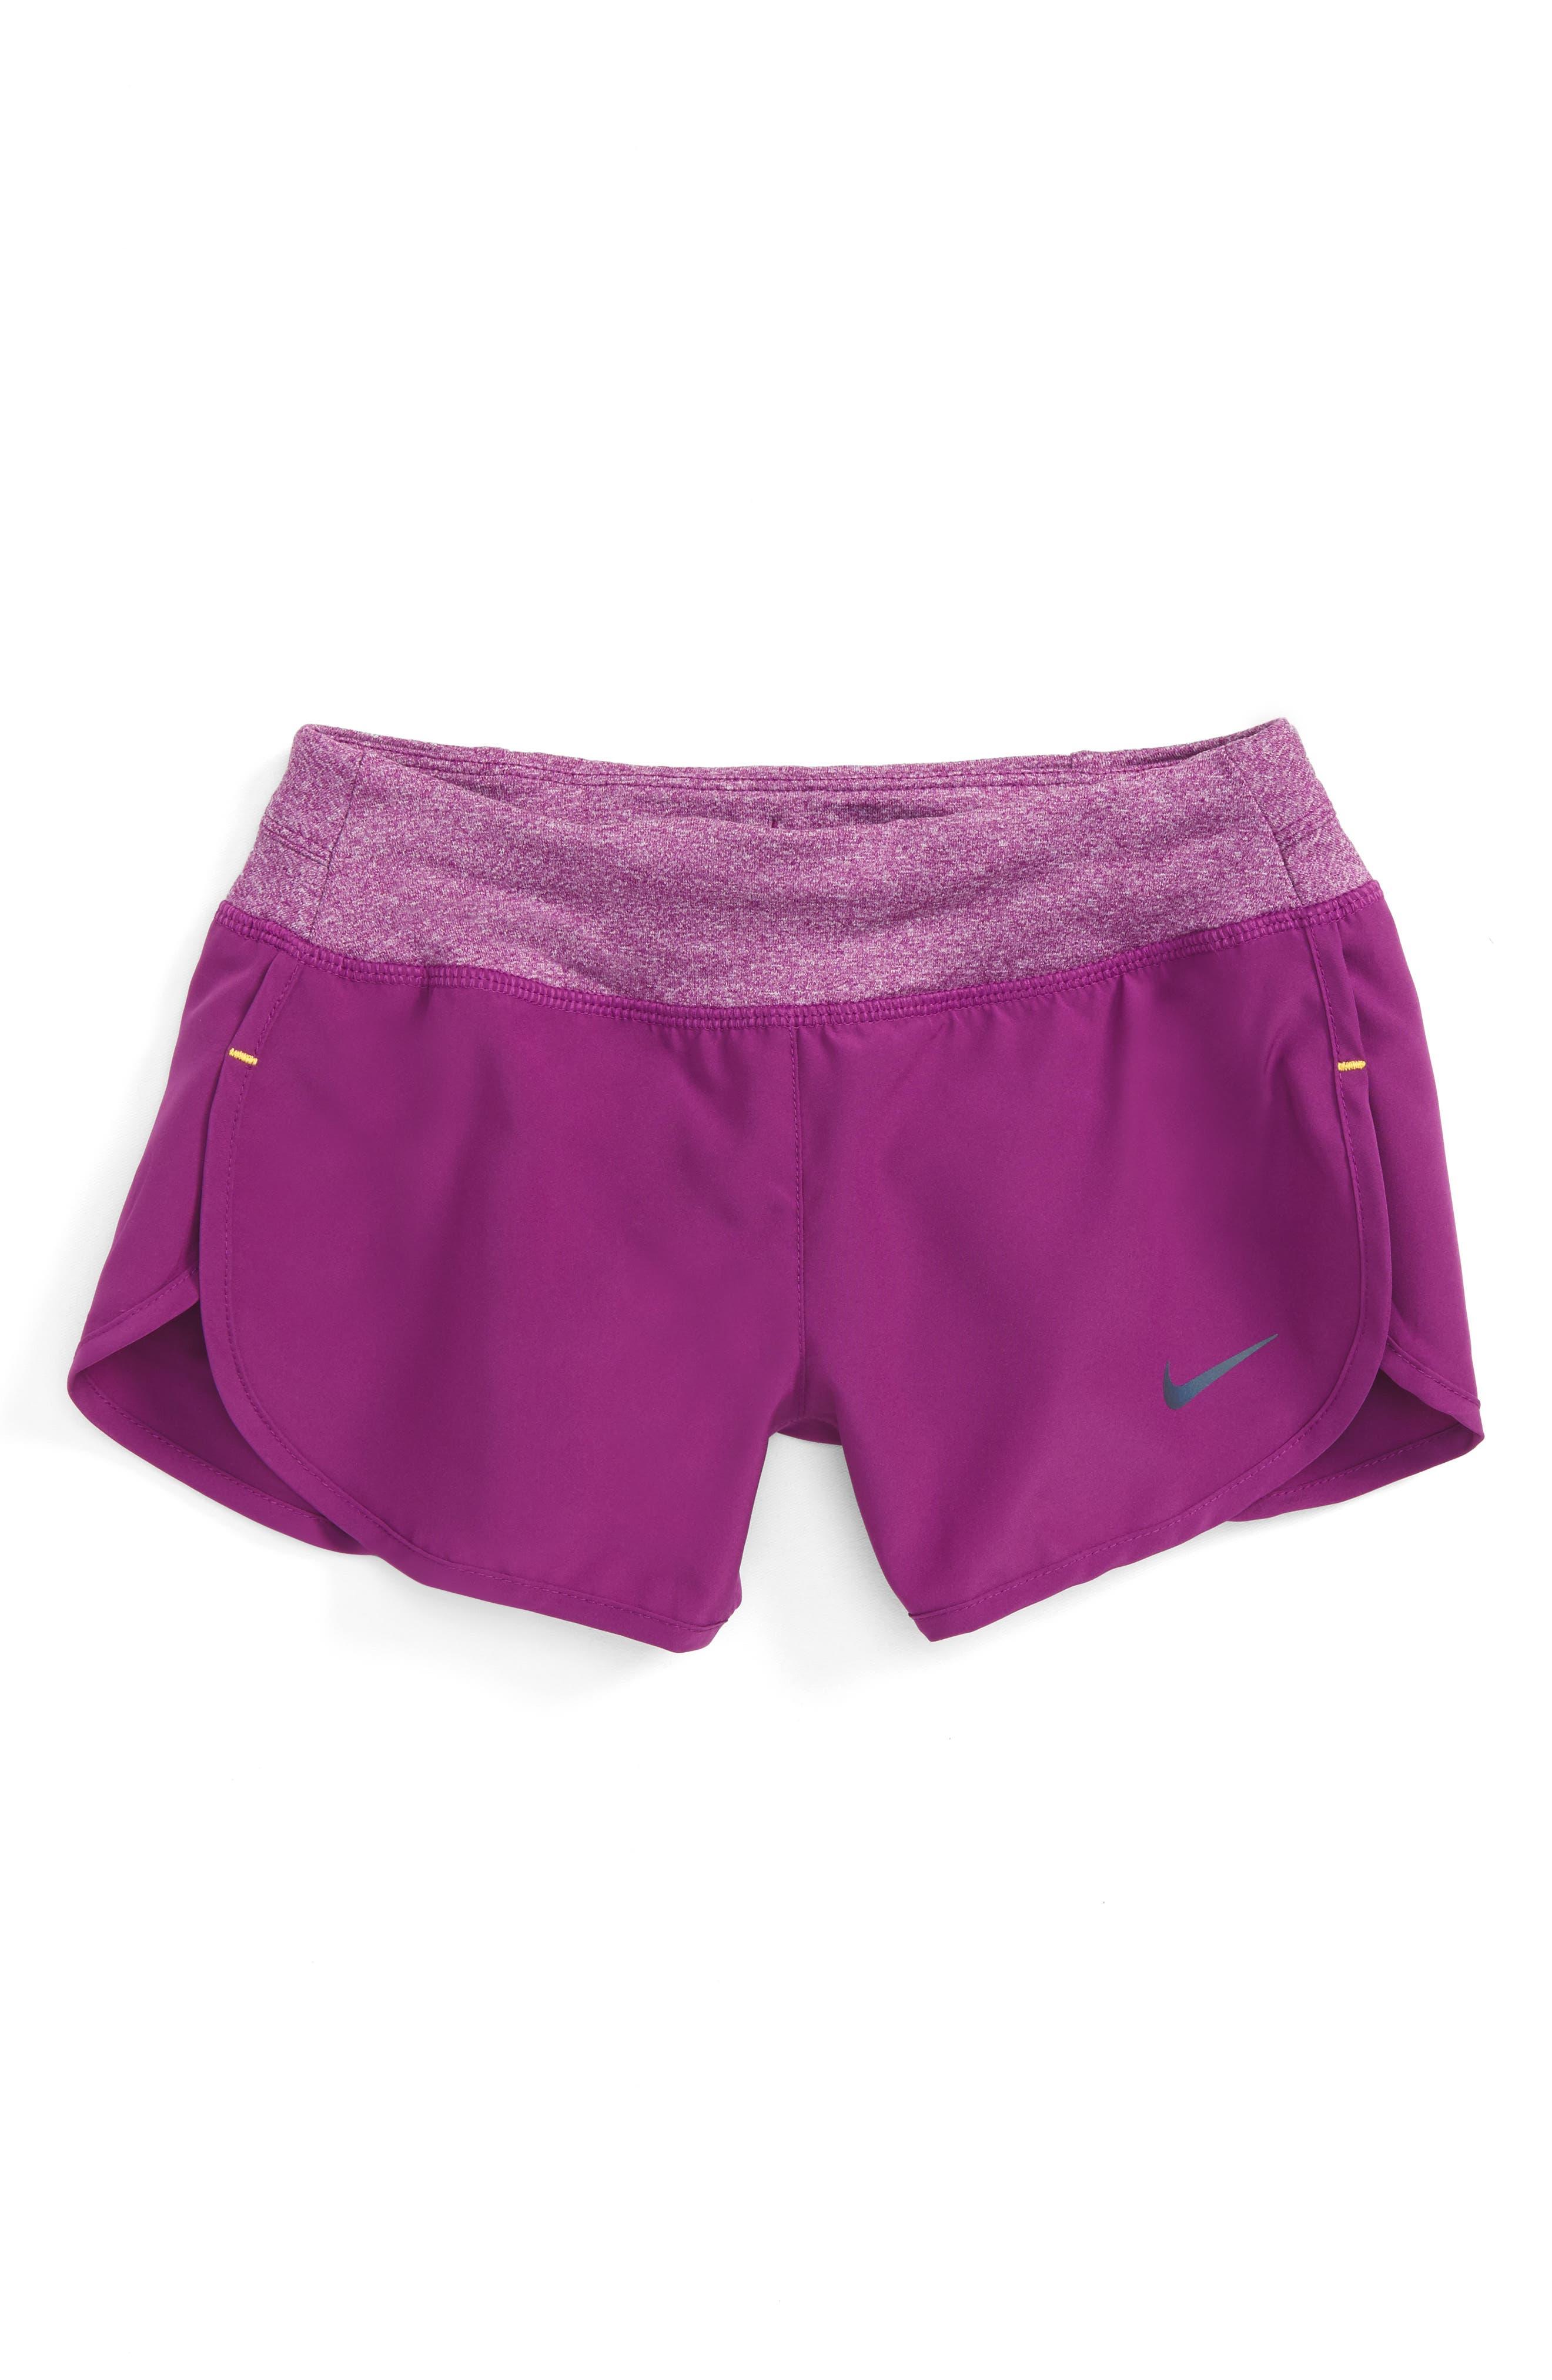 Alternate Image 1 Selected - Nike 'Rival' Dri-FIT Shorts (Big Girls)